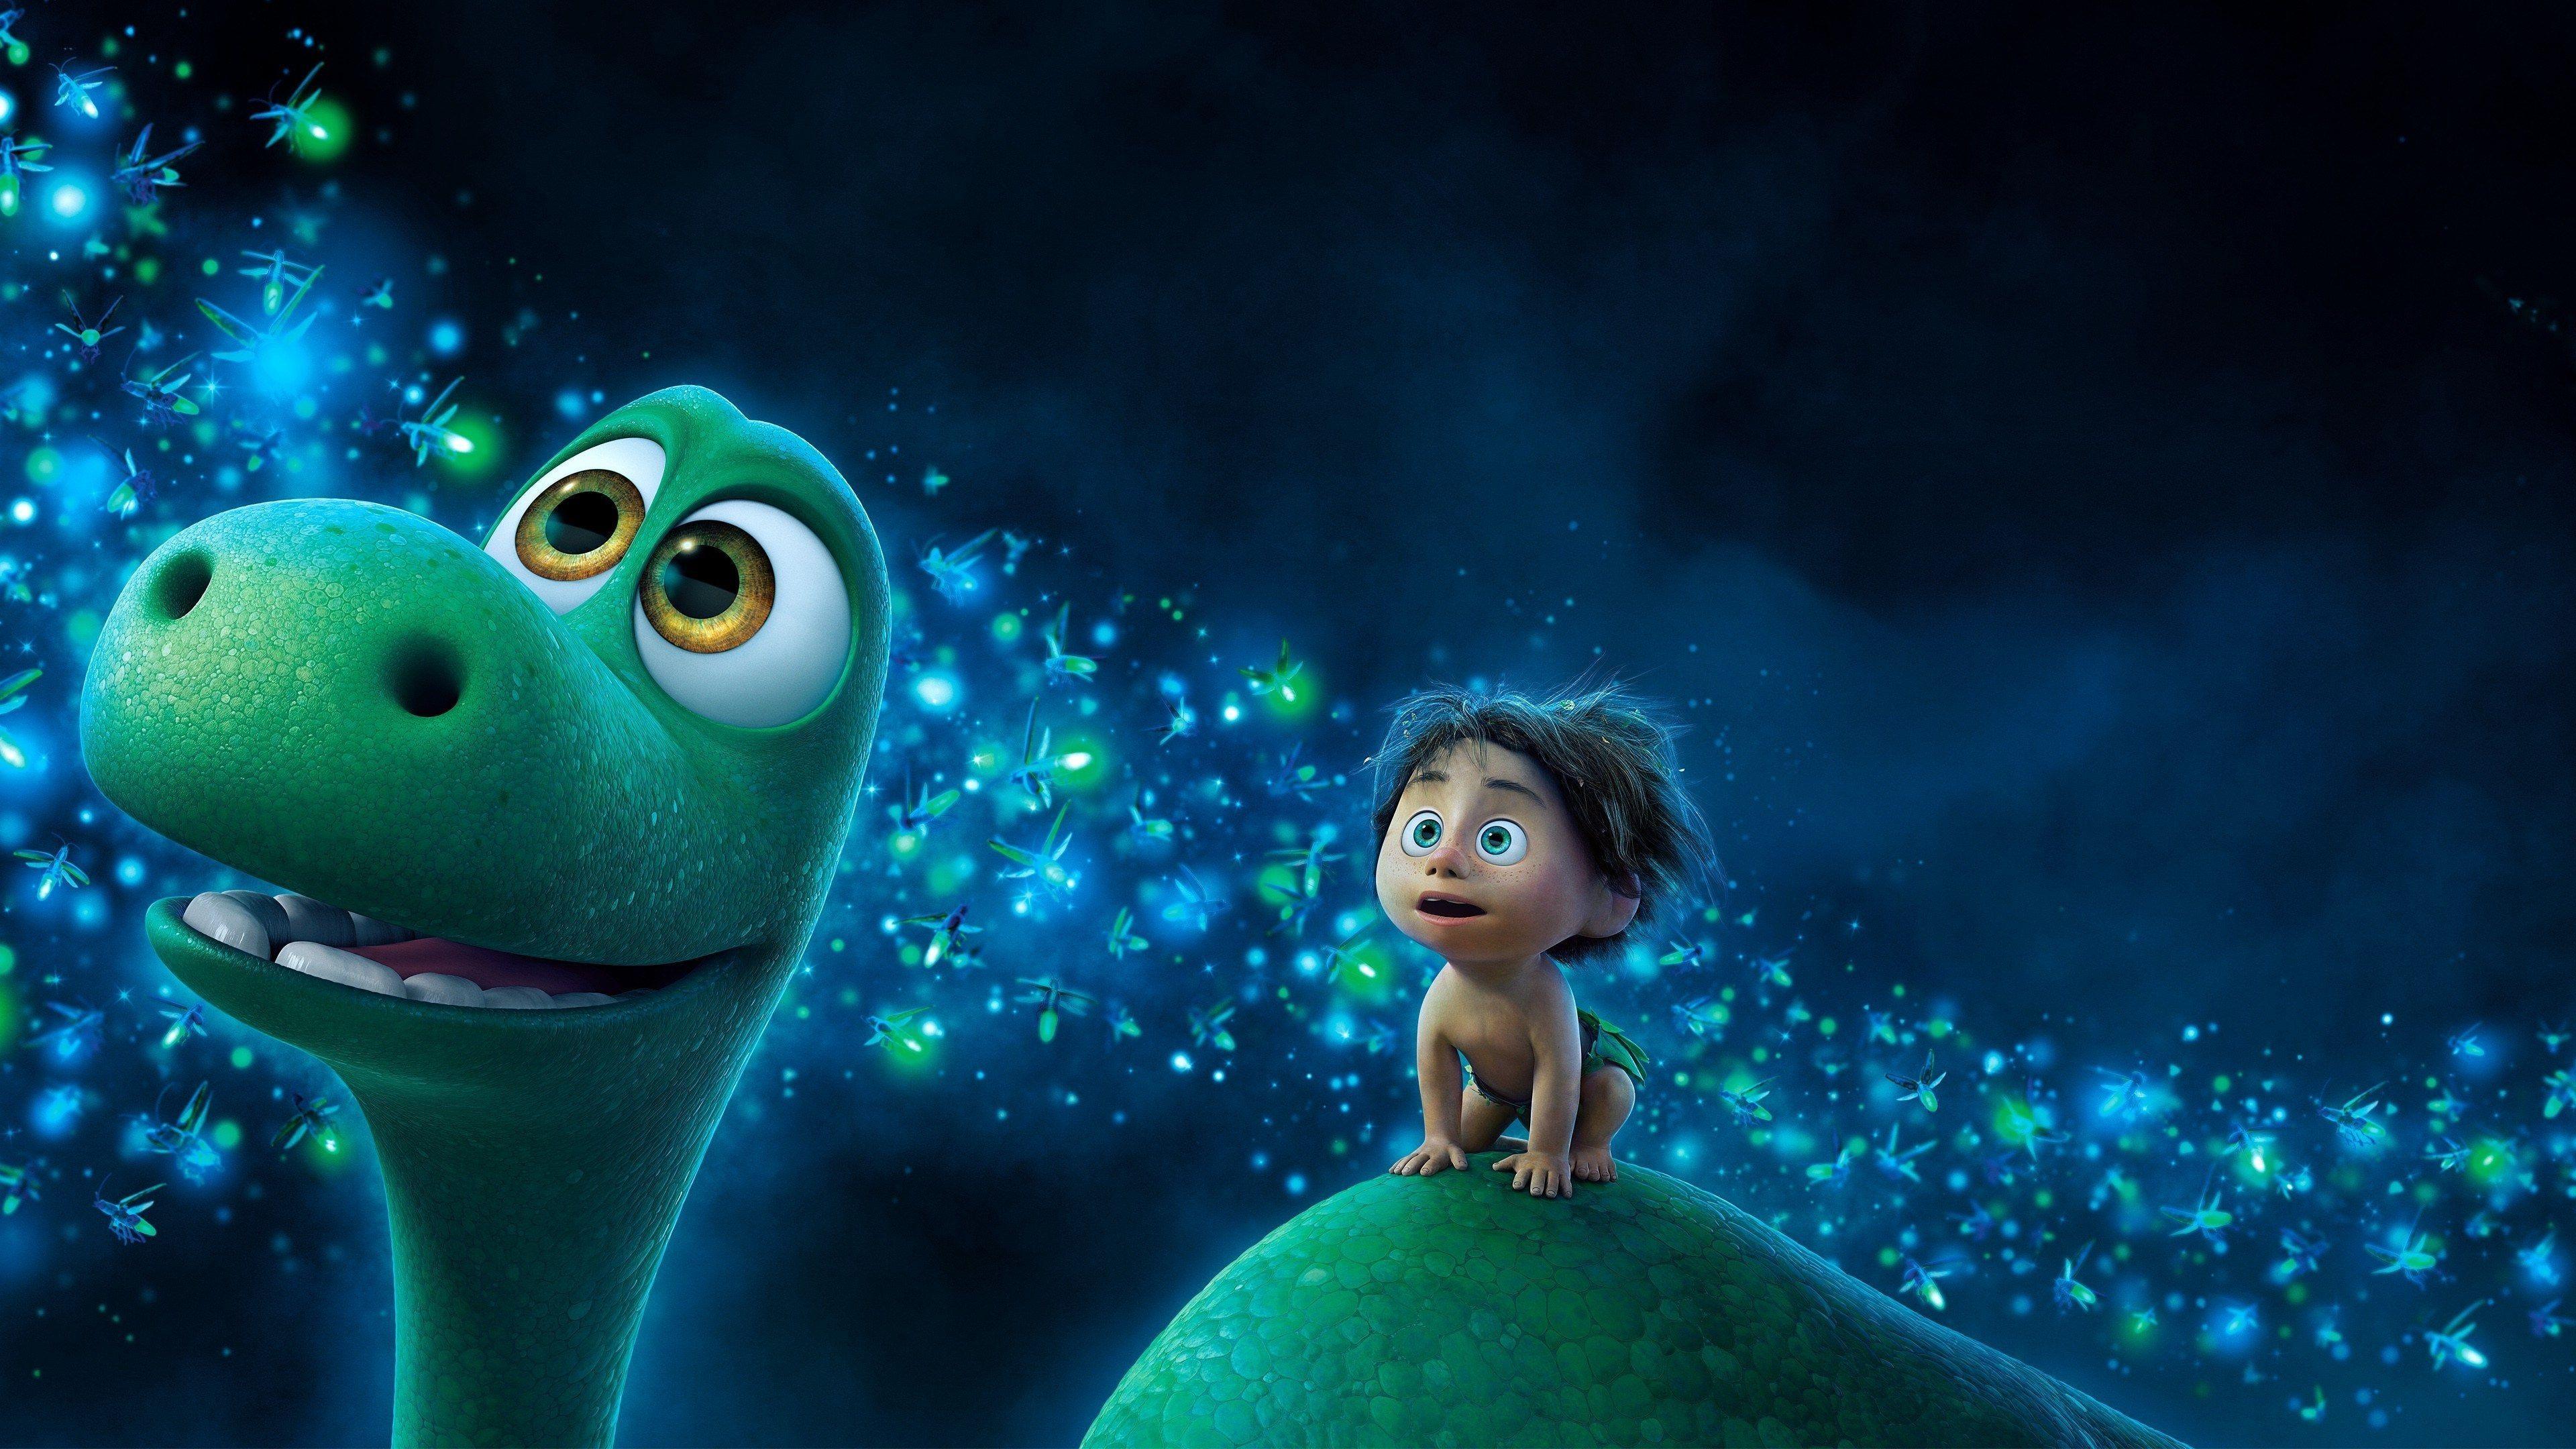 خلفيات افلام كرتون Hd عالية الجوده Tecnologis The Good Dinosaur Pixar Movies Movie Wallpapers